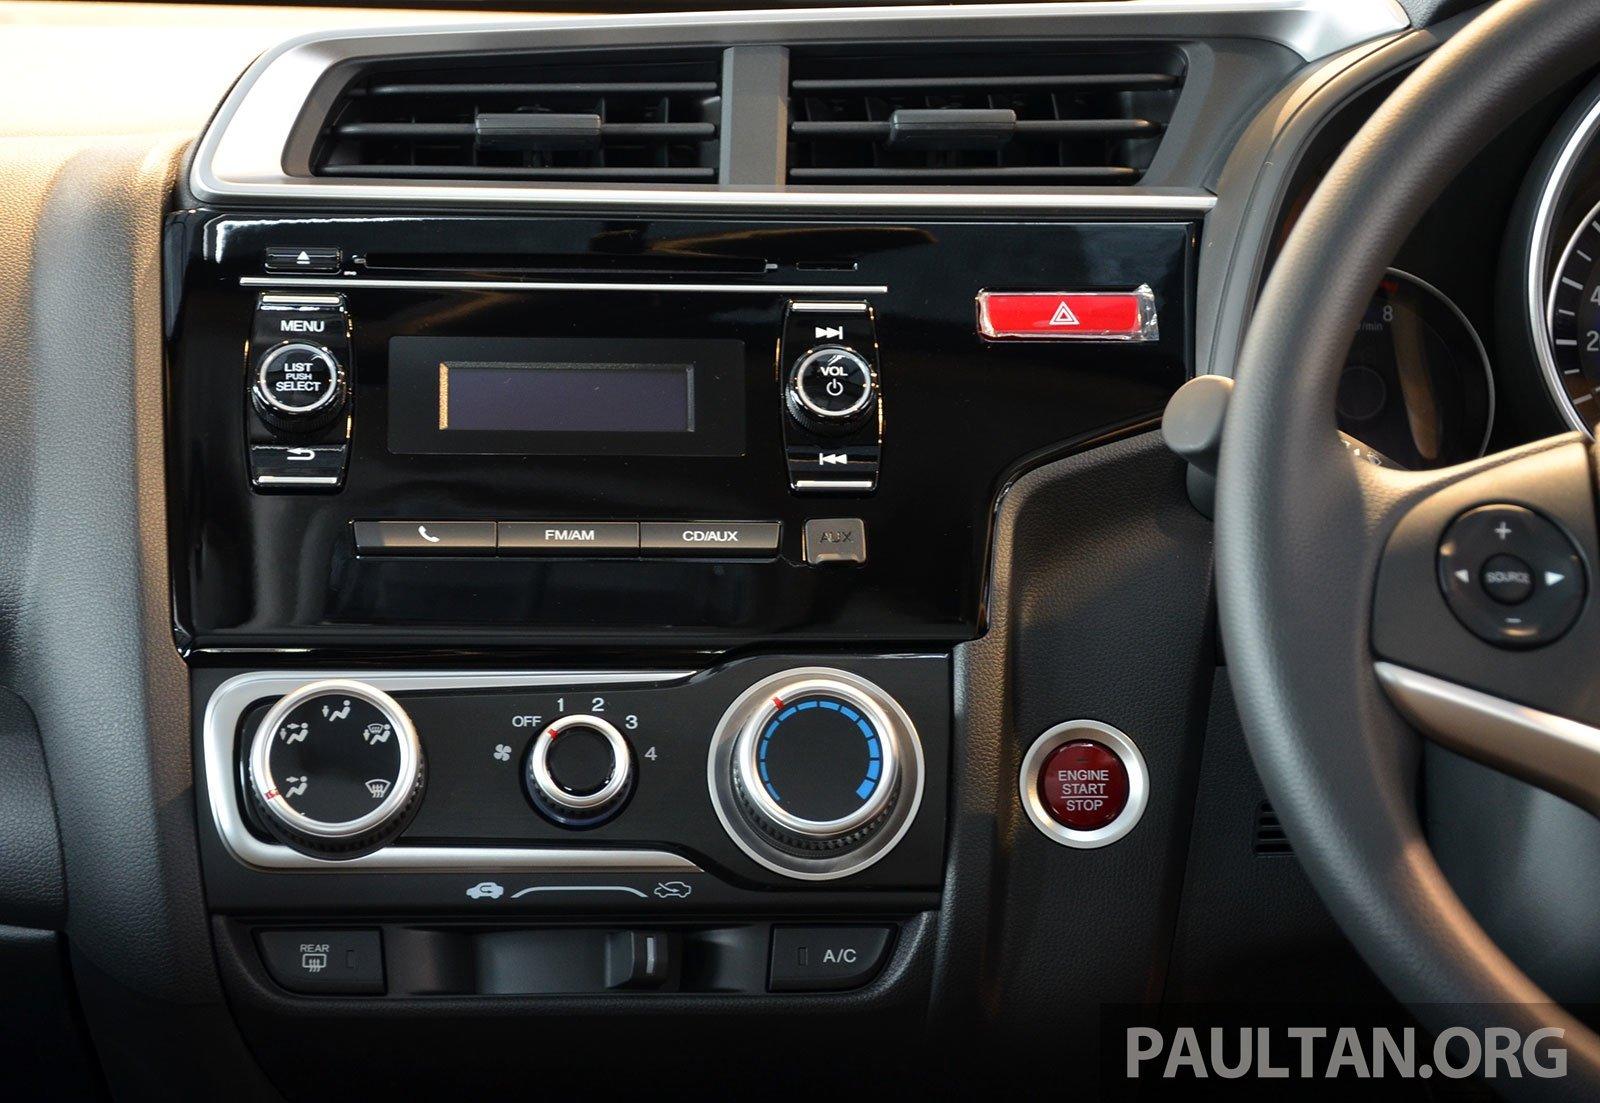 Car interior malaysia - Honda Jazz 2014 Interior Malaysia